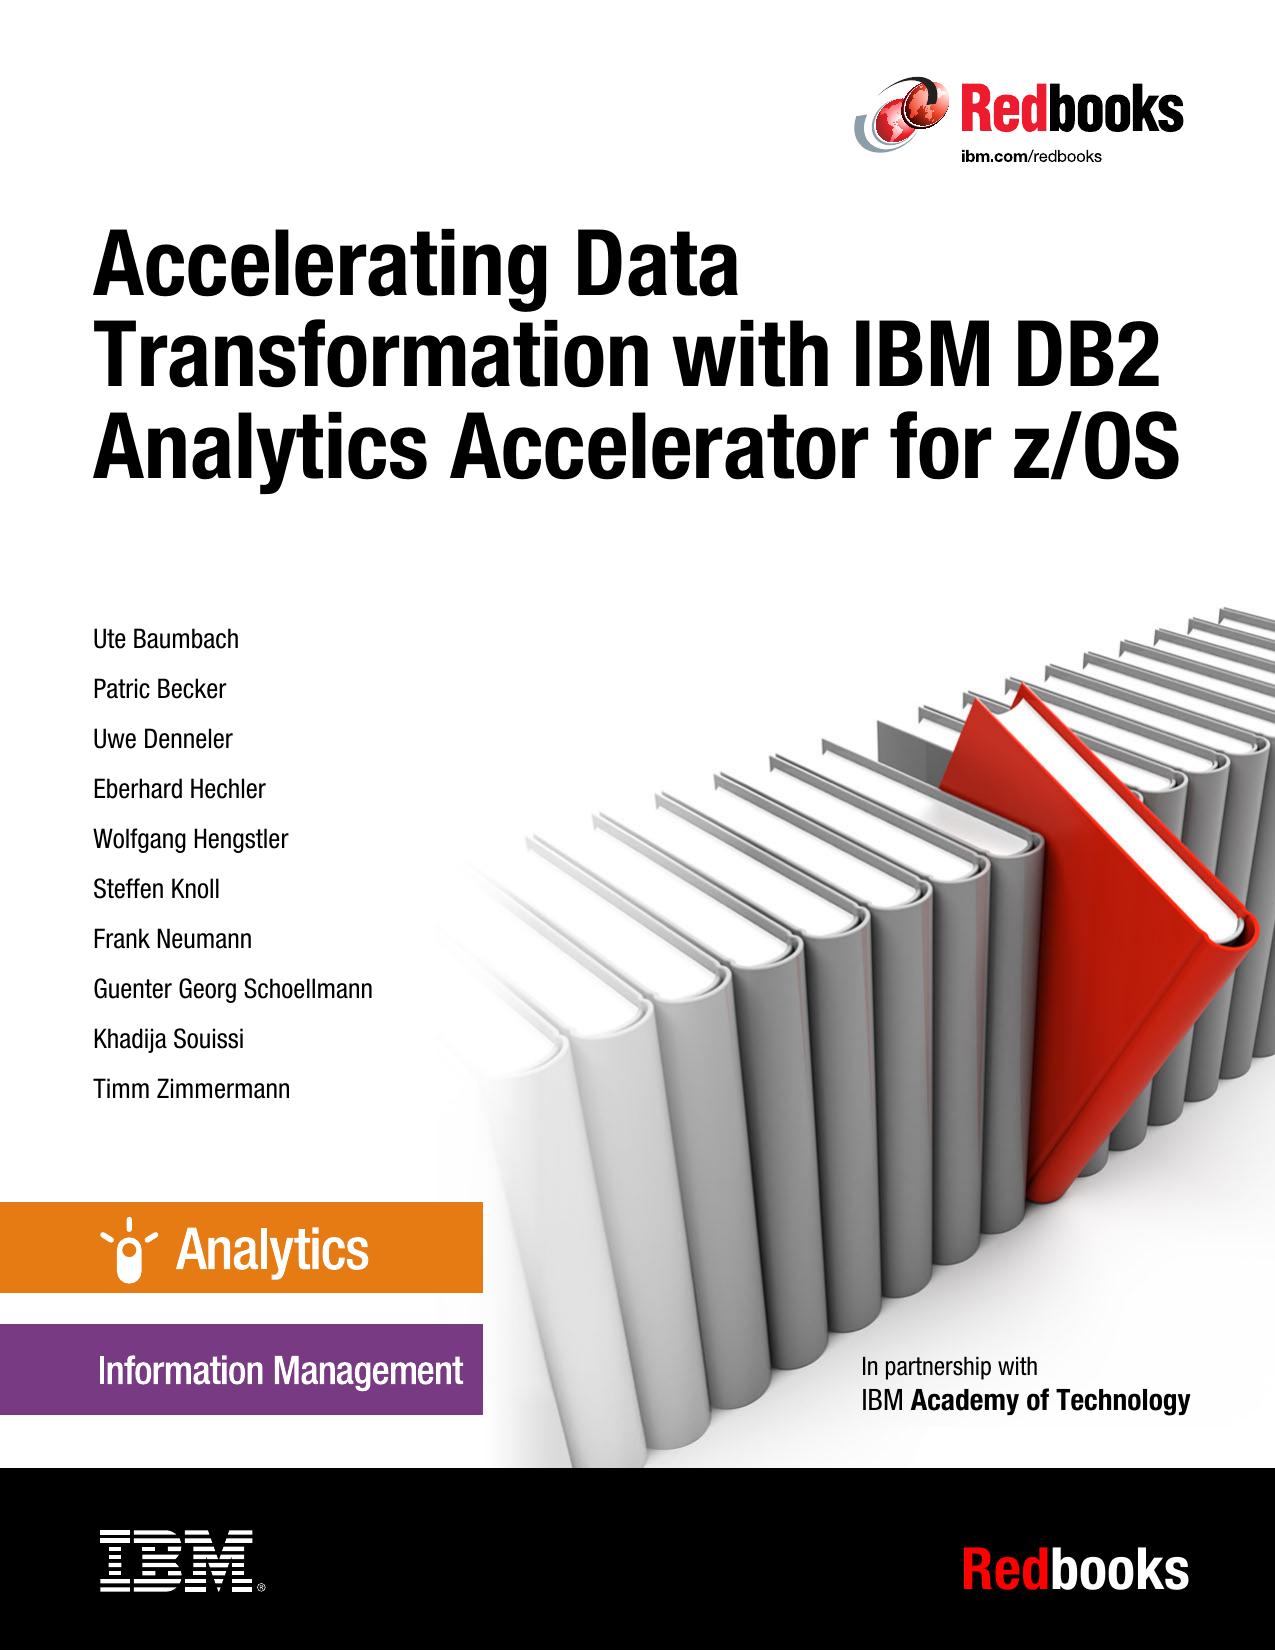 Accelerating Data Transformation with IBM DB2 | manualzz com